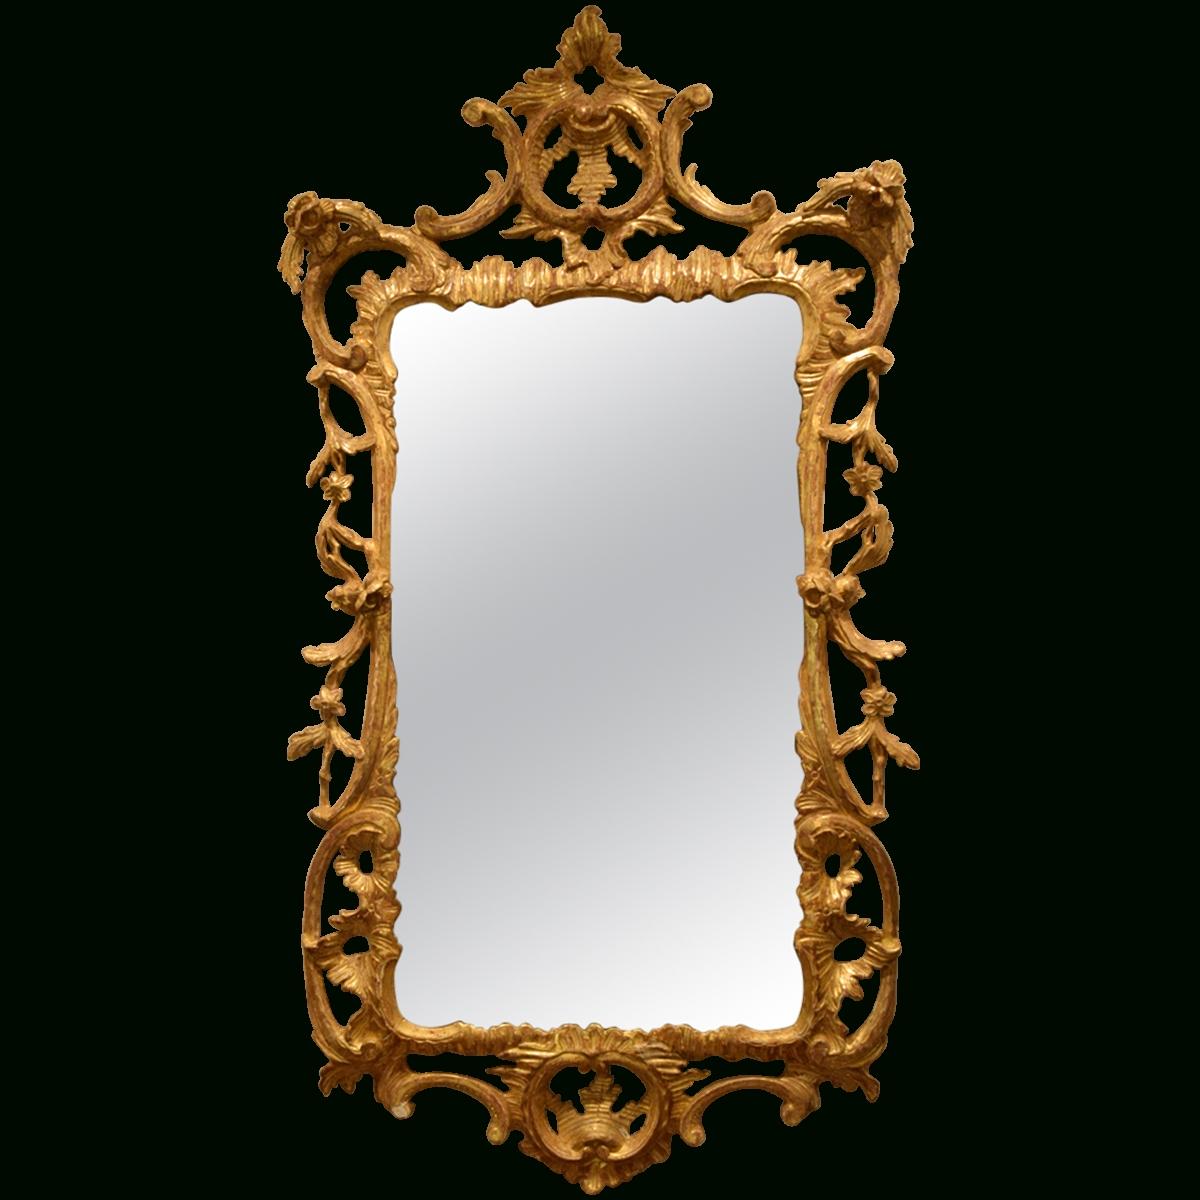 Viyet – Designer Furniture – Accessories – Antique Wall Mirror With Regard To Antique Wall Mirror (Image 20 of 20)